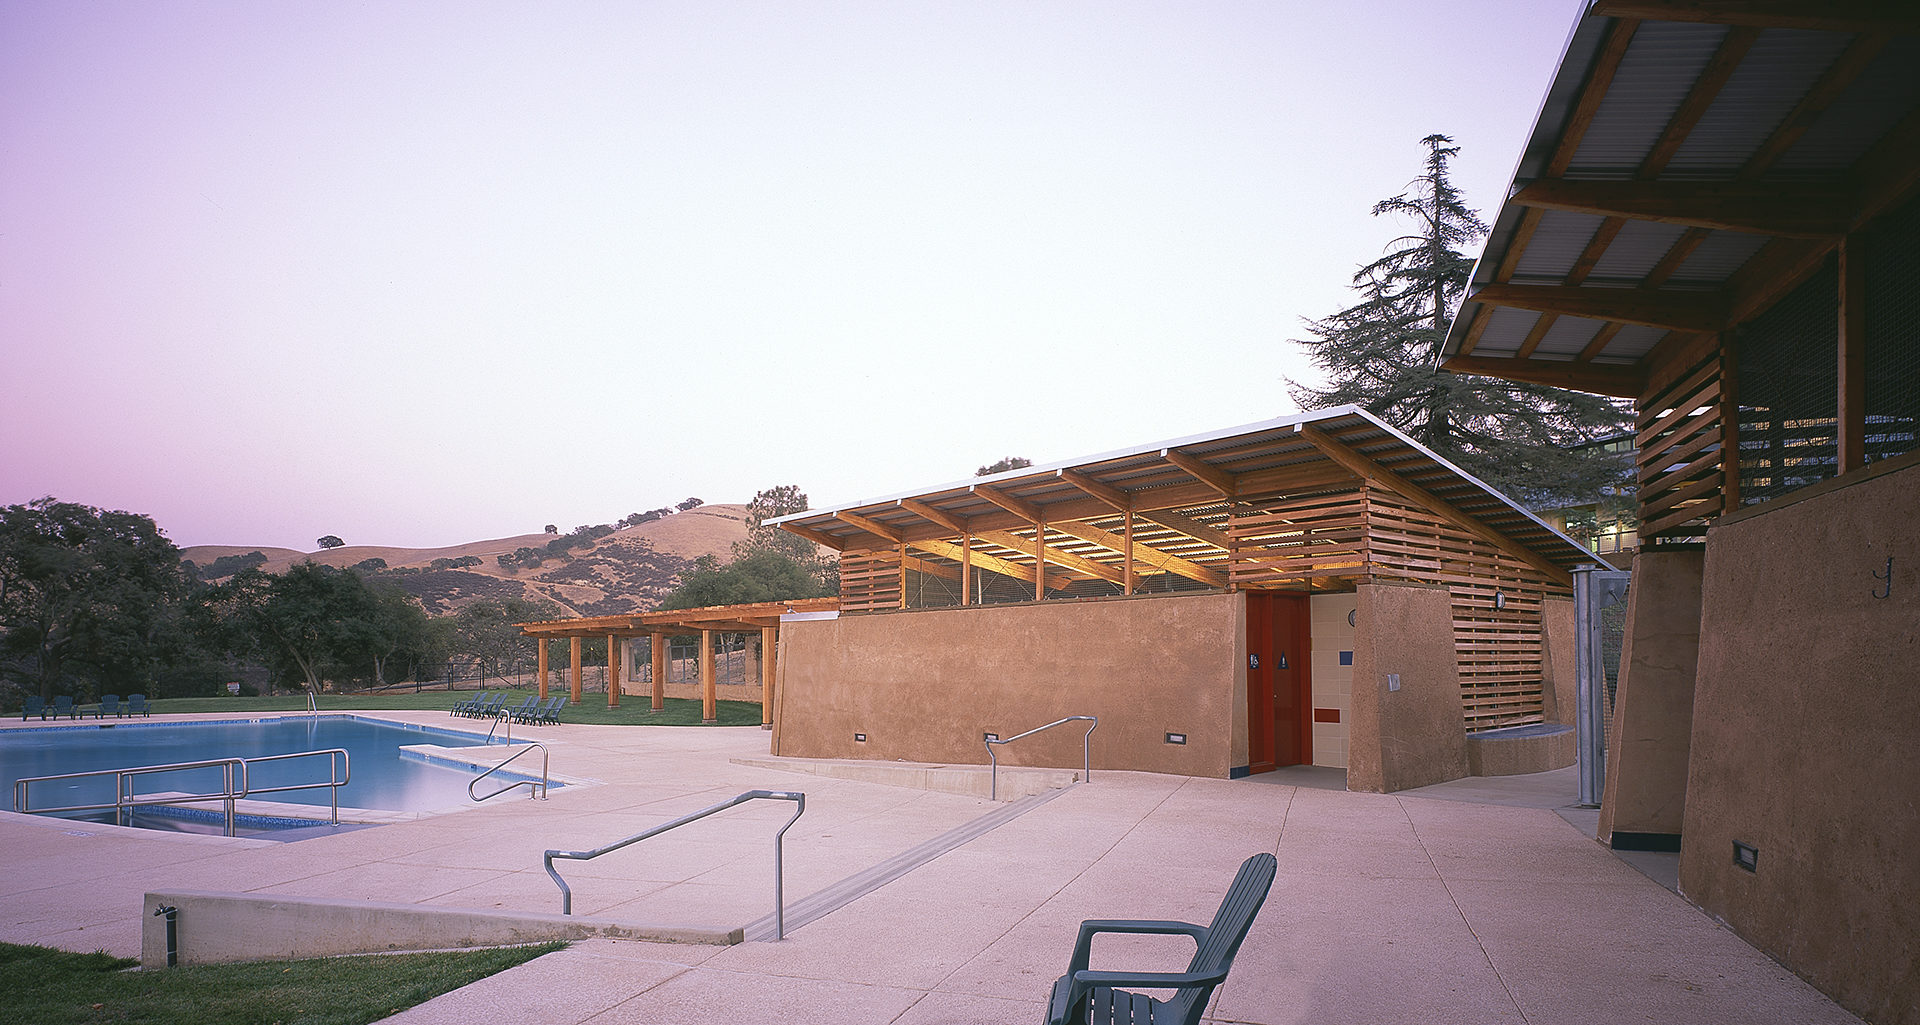 camp-arroyo-10